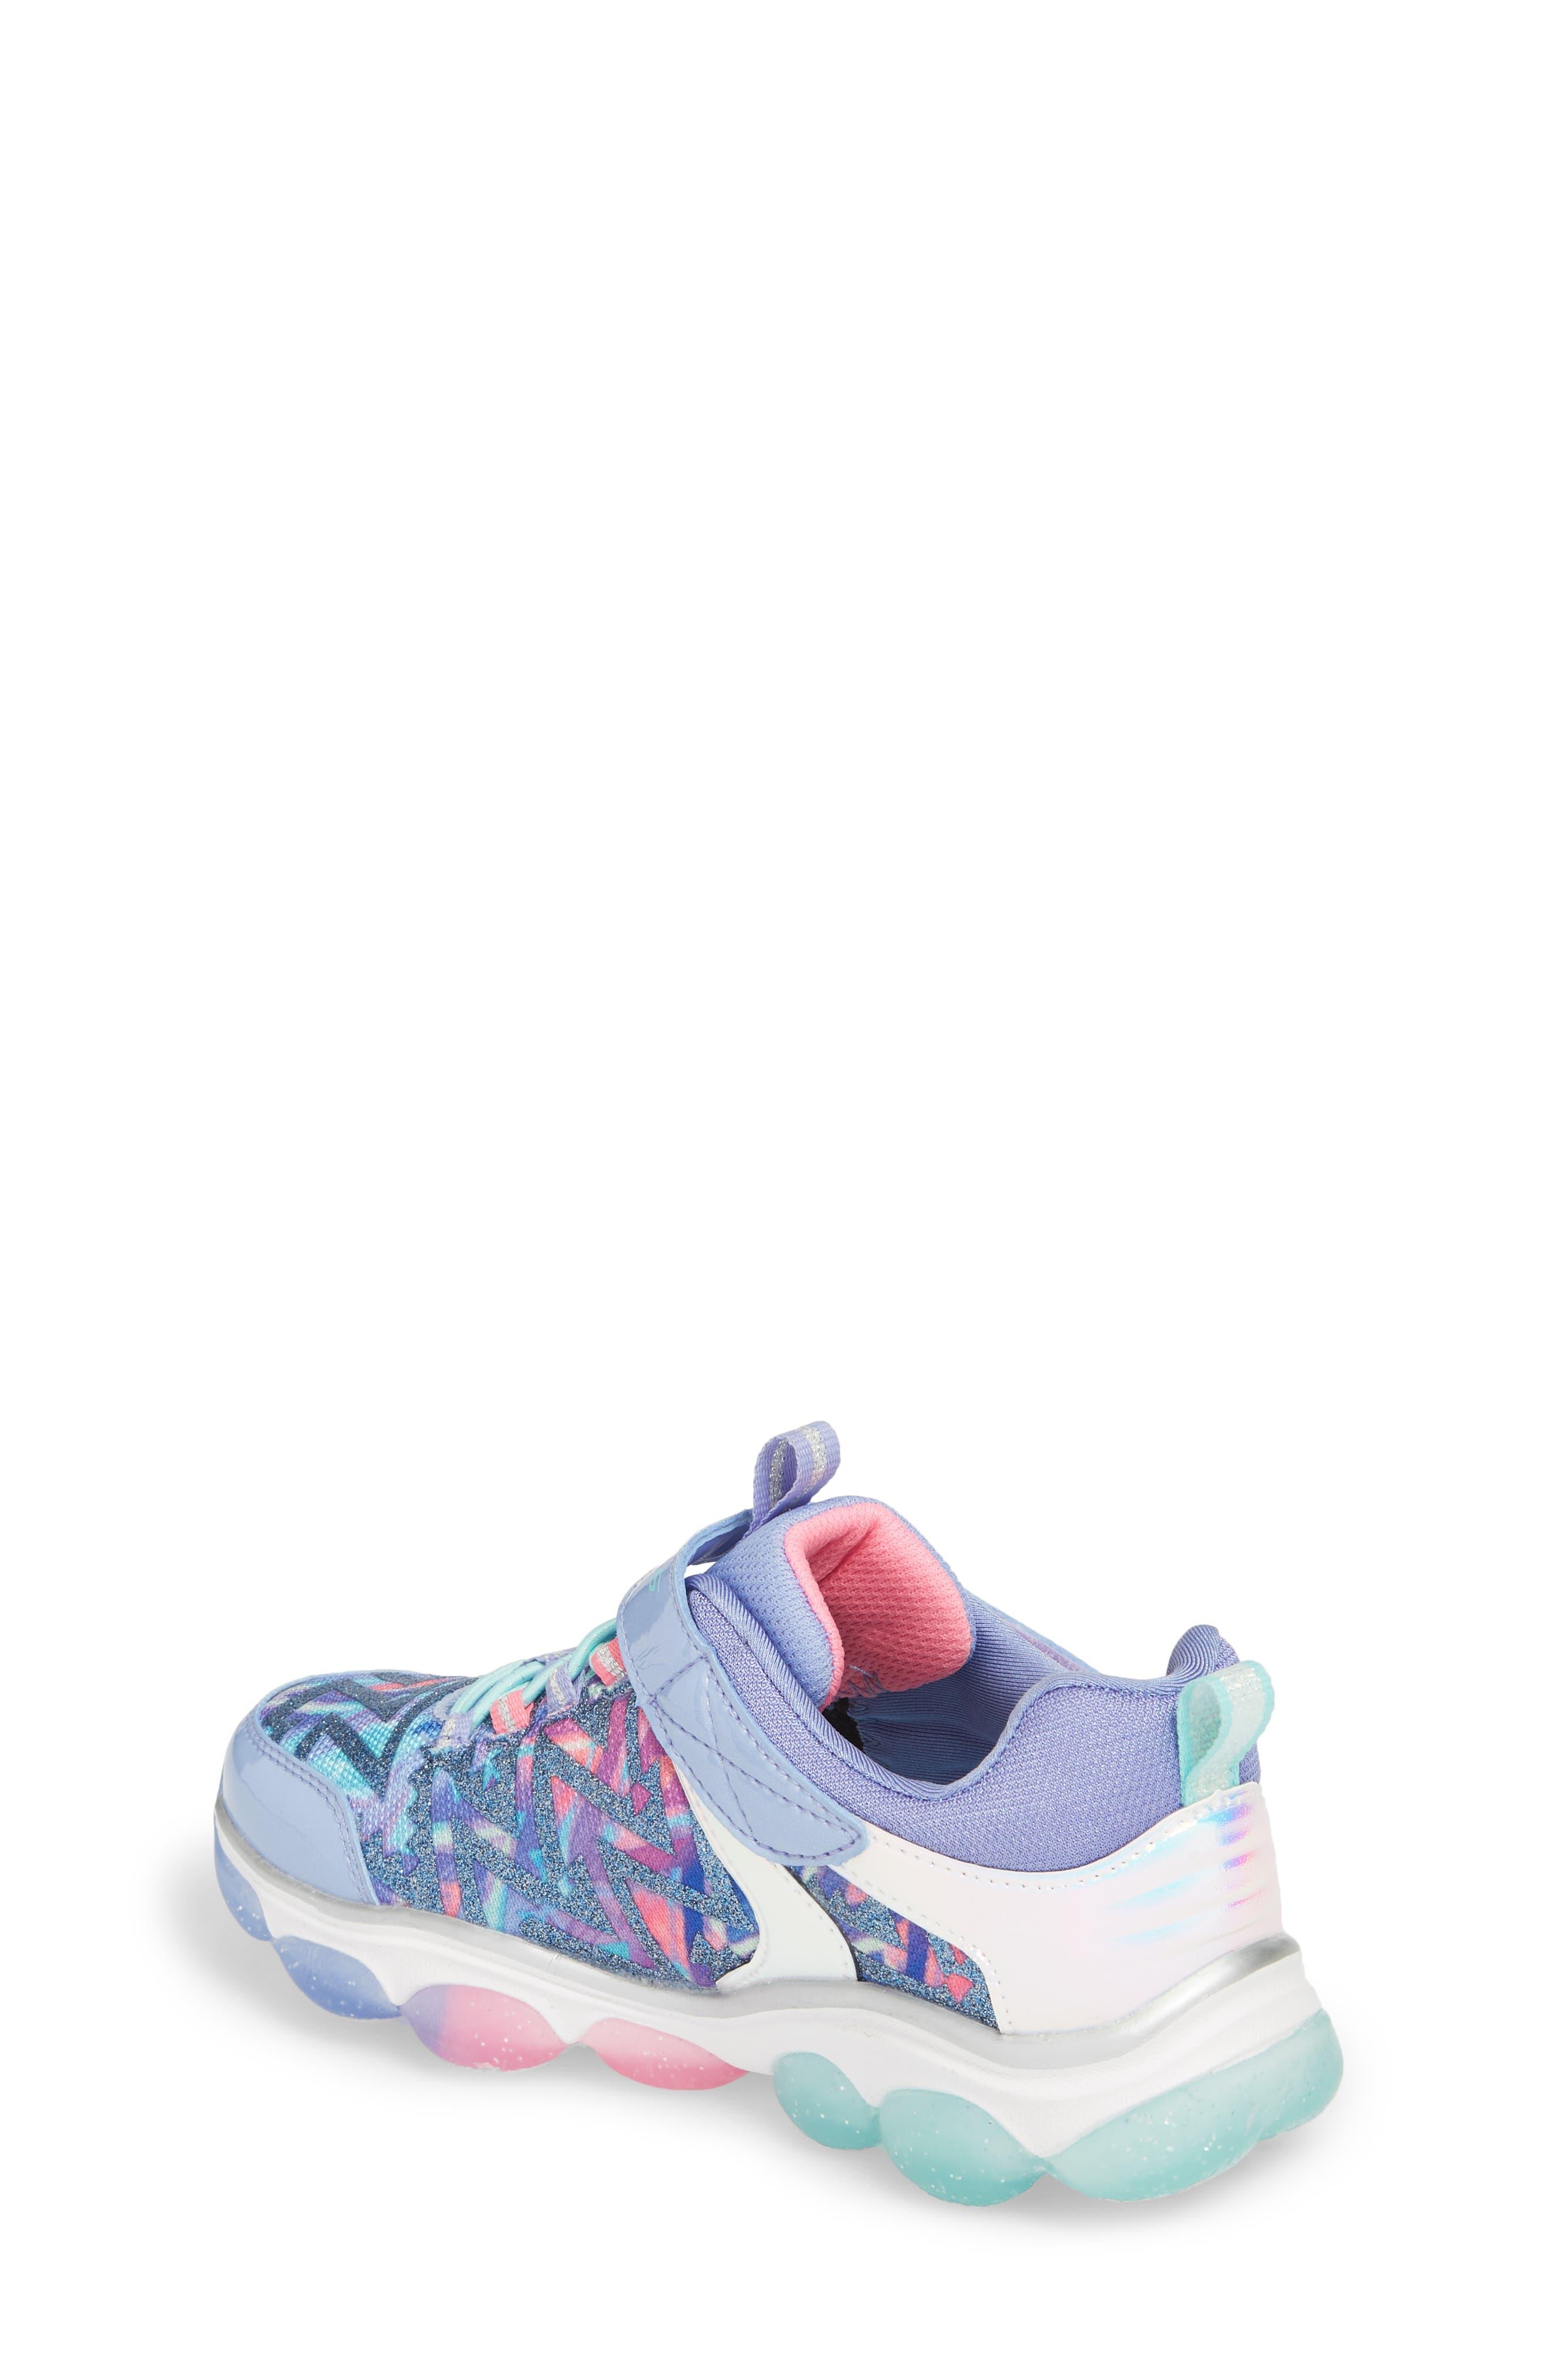 Skech-Air Groove Glitter N Go Sneakers,                             Alternate thumbnail 2, color,                             500